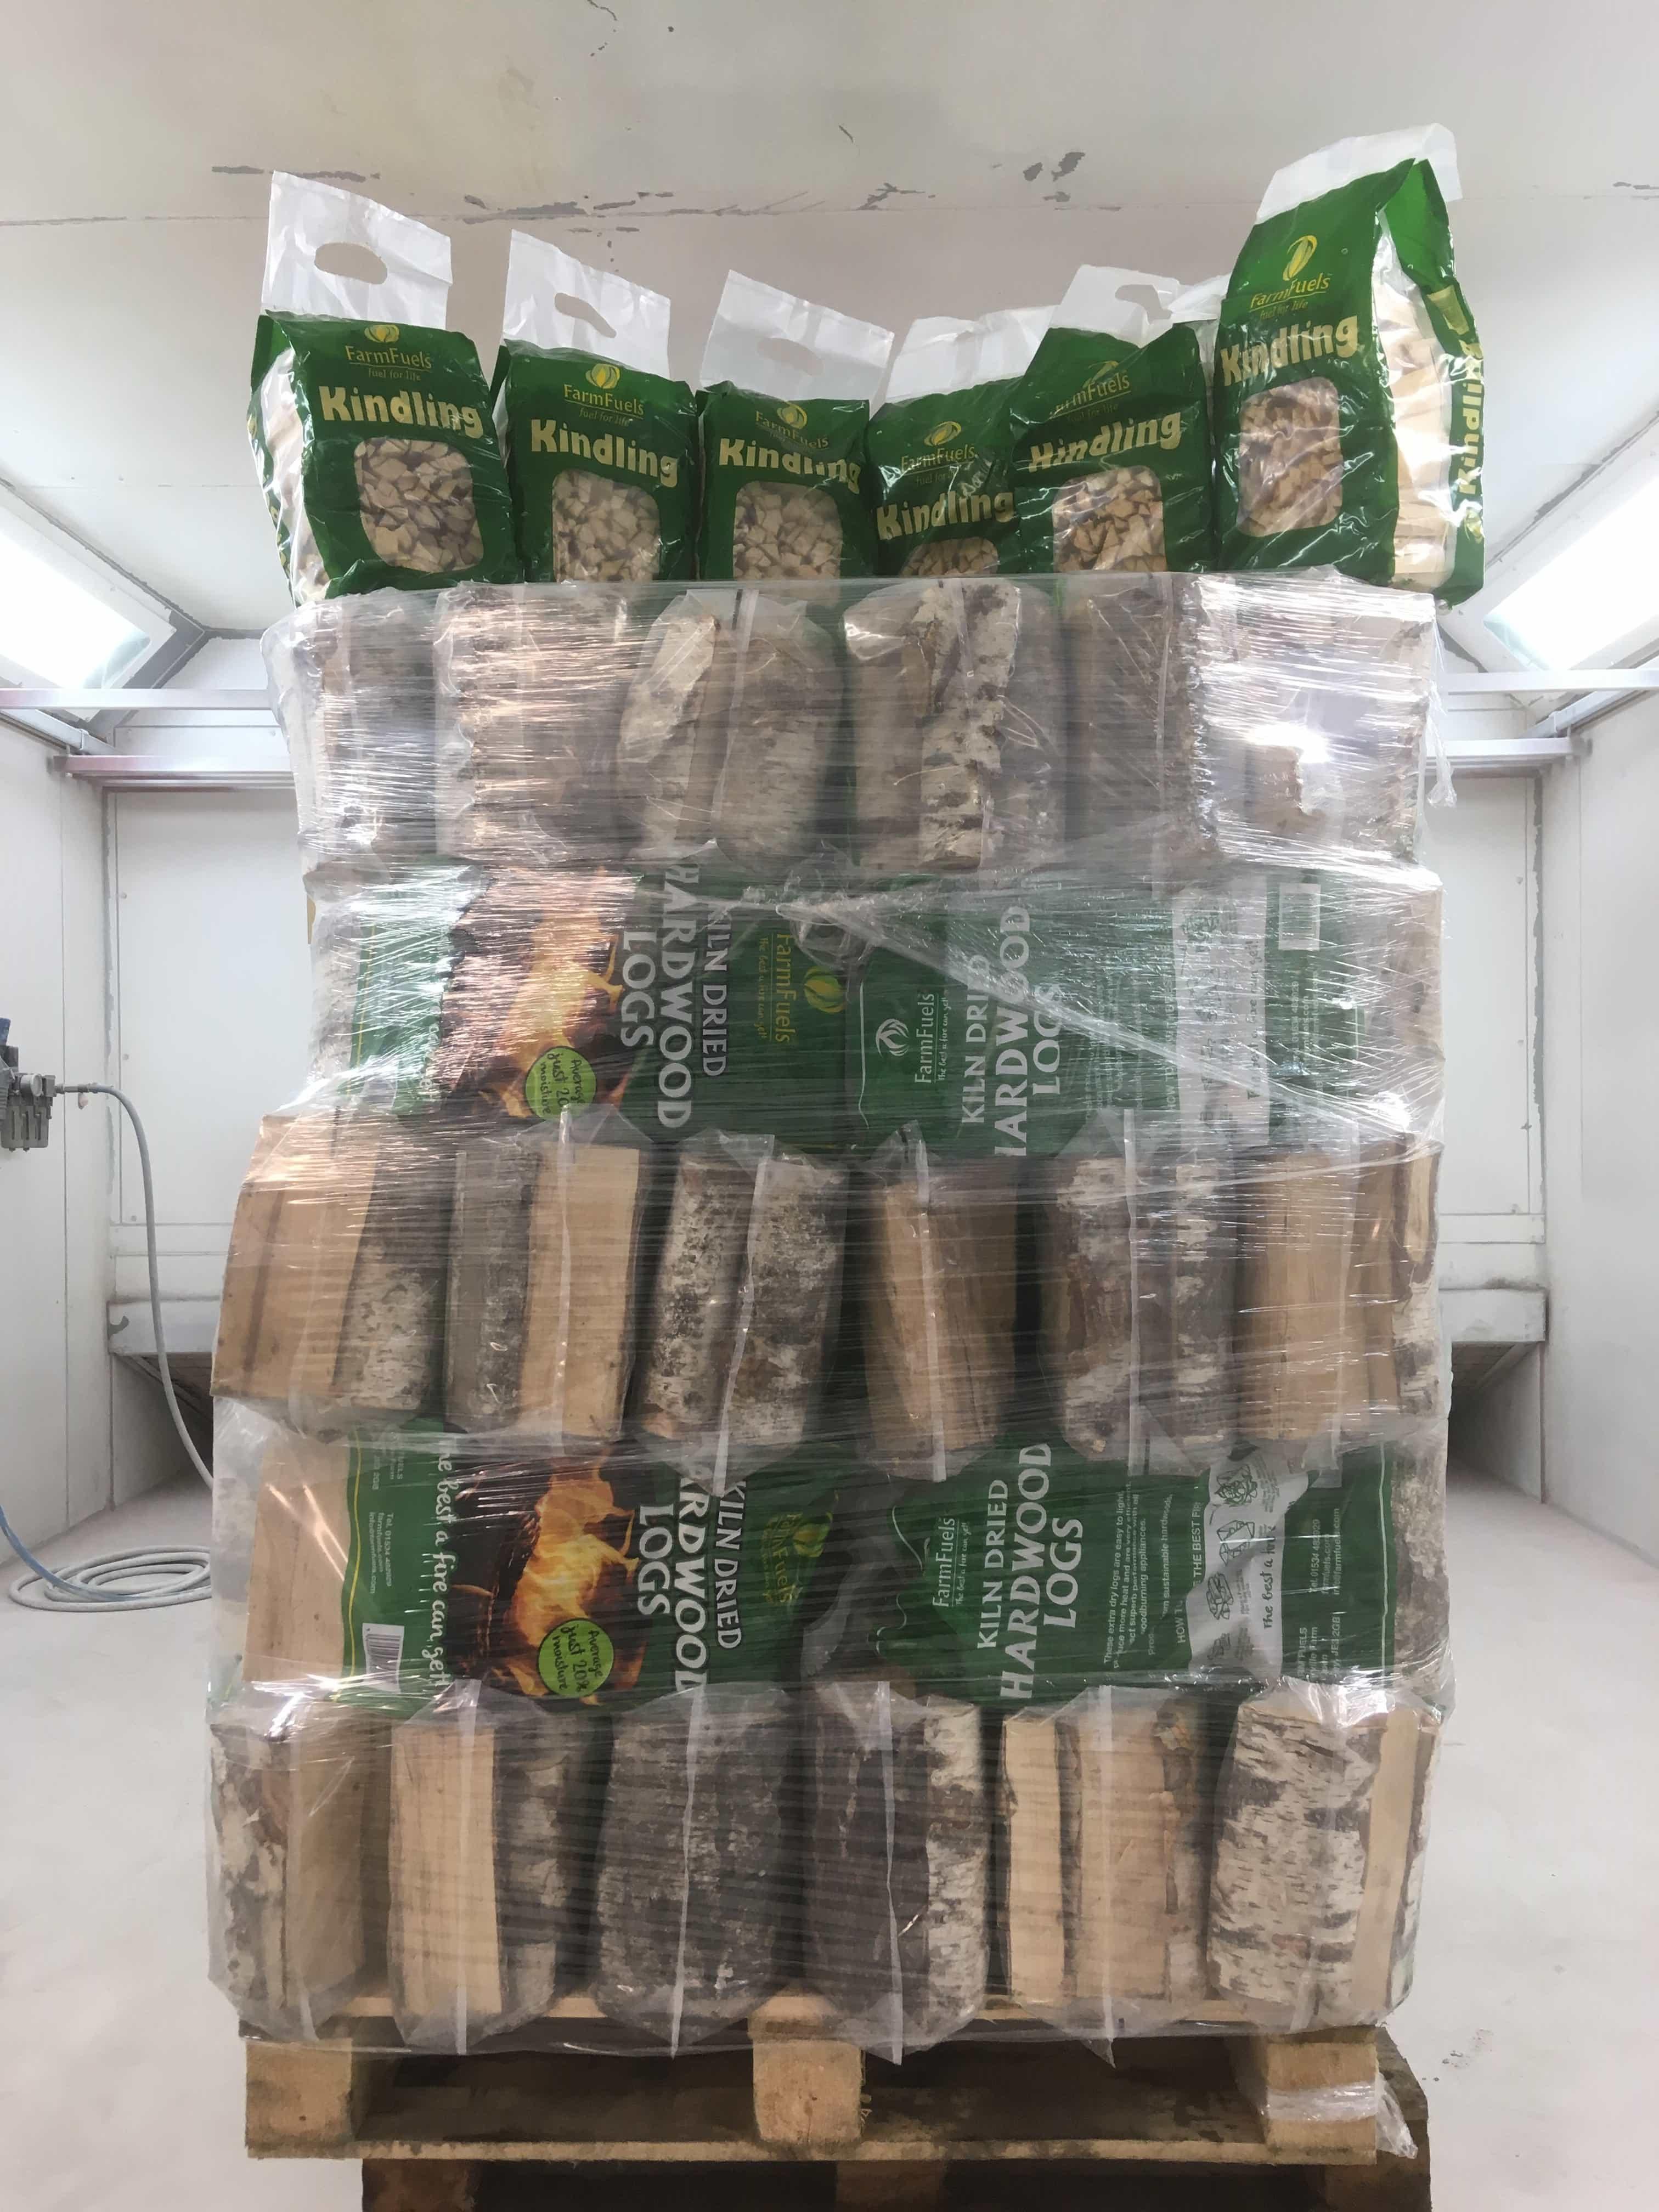 60 Kiln Dried Hardwood Logs 30L Polythene + 6 FREE bags of Kindling